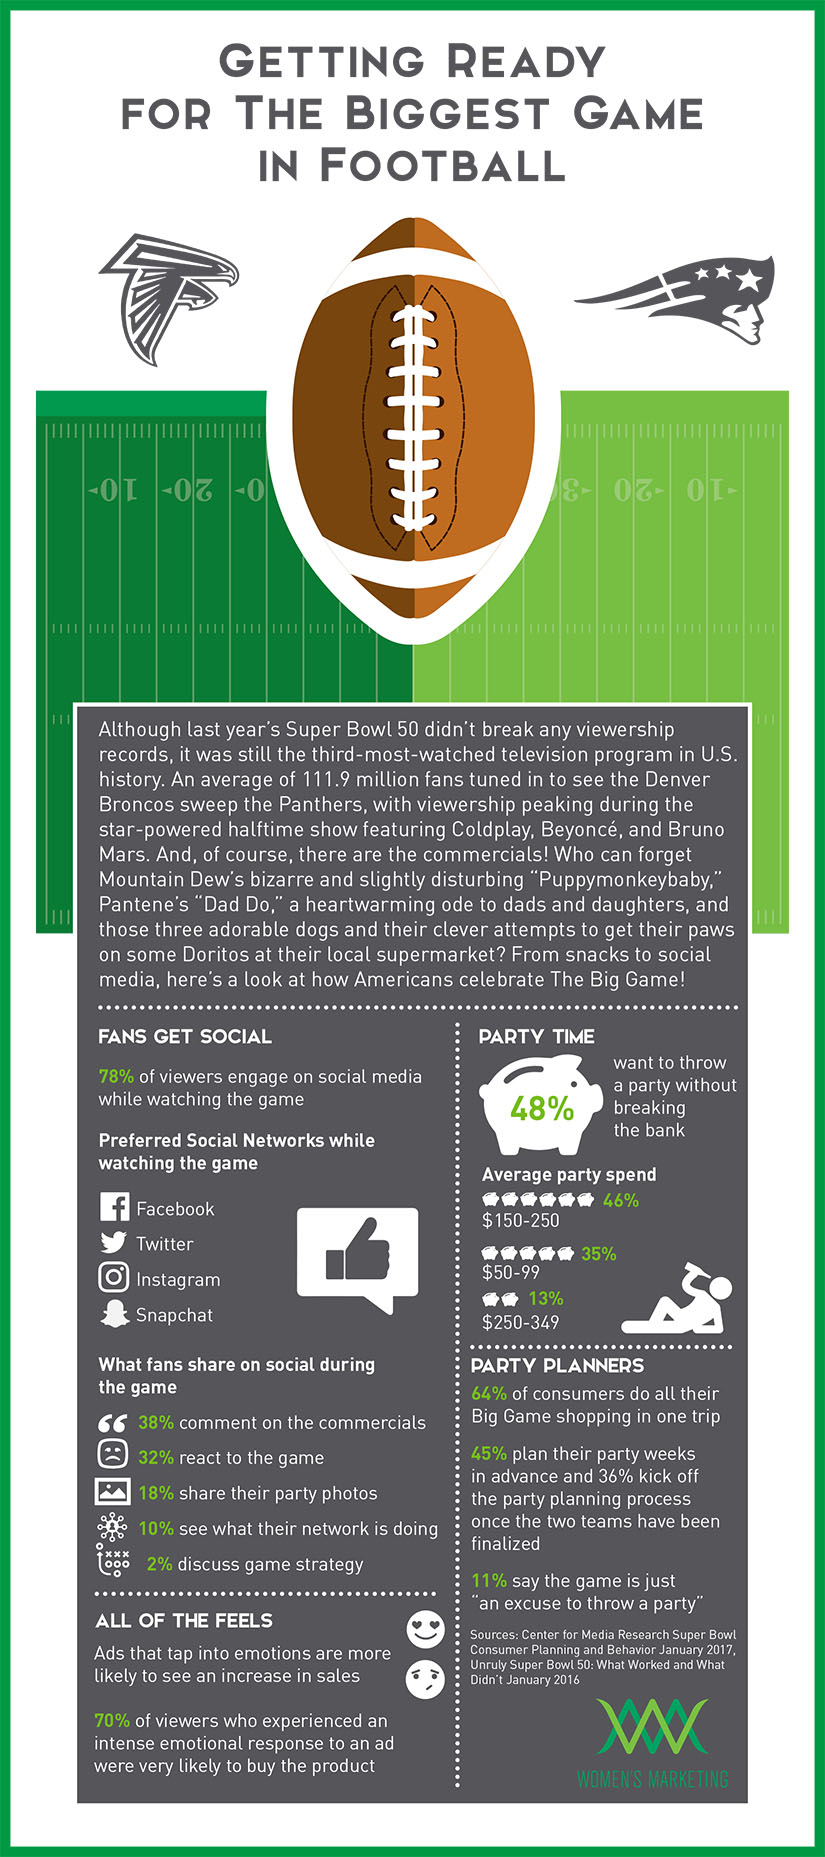 BiggestGameinFootball_Infographic.jpg